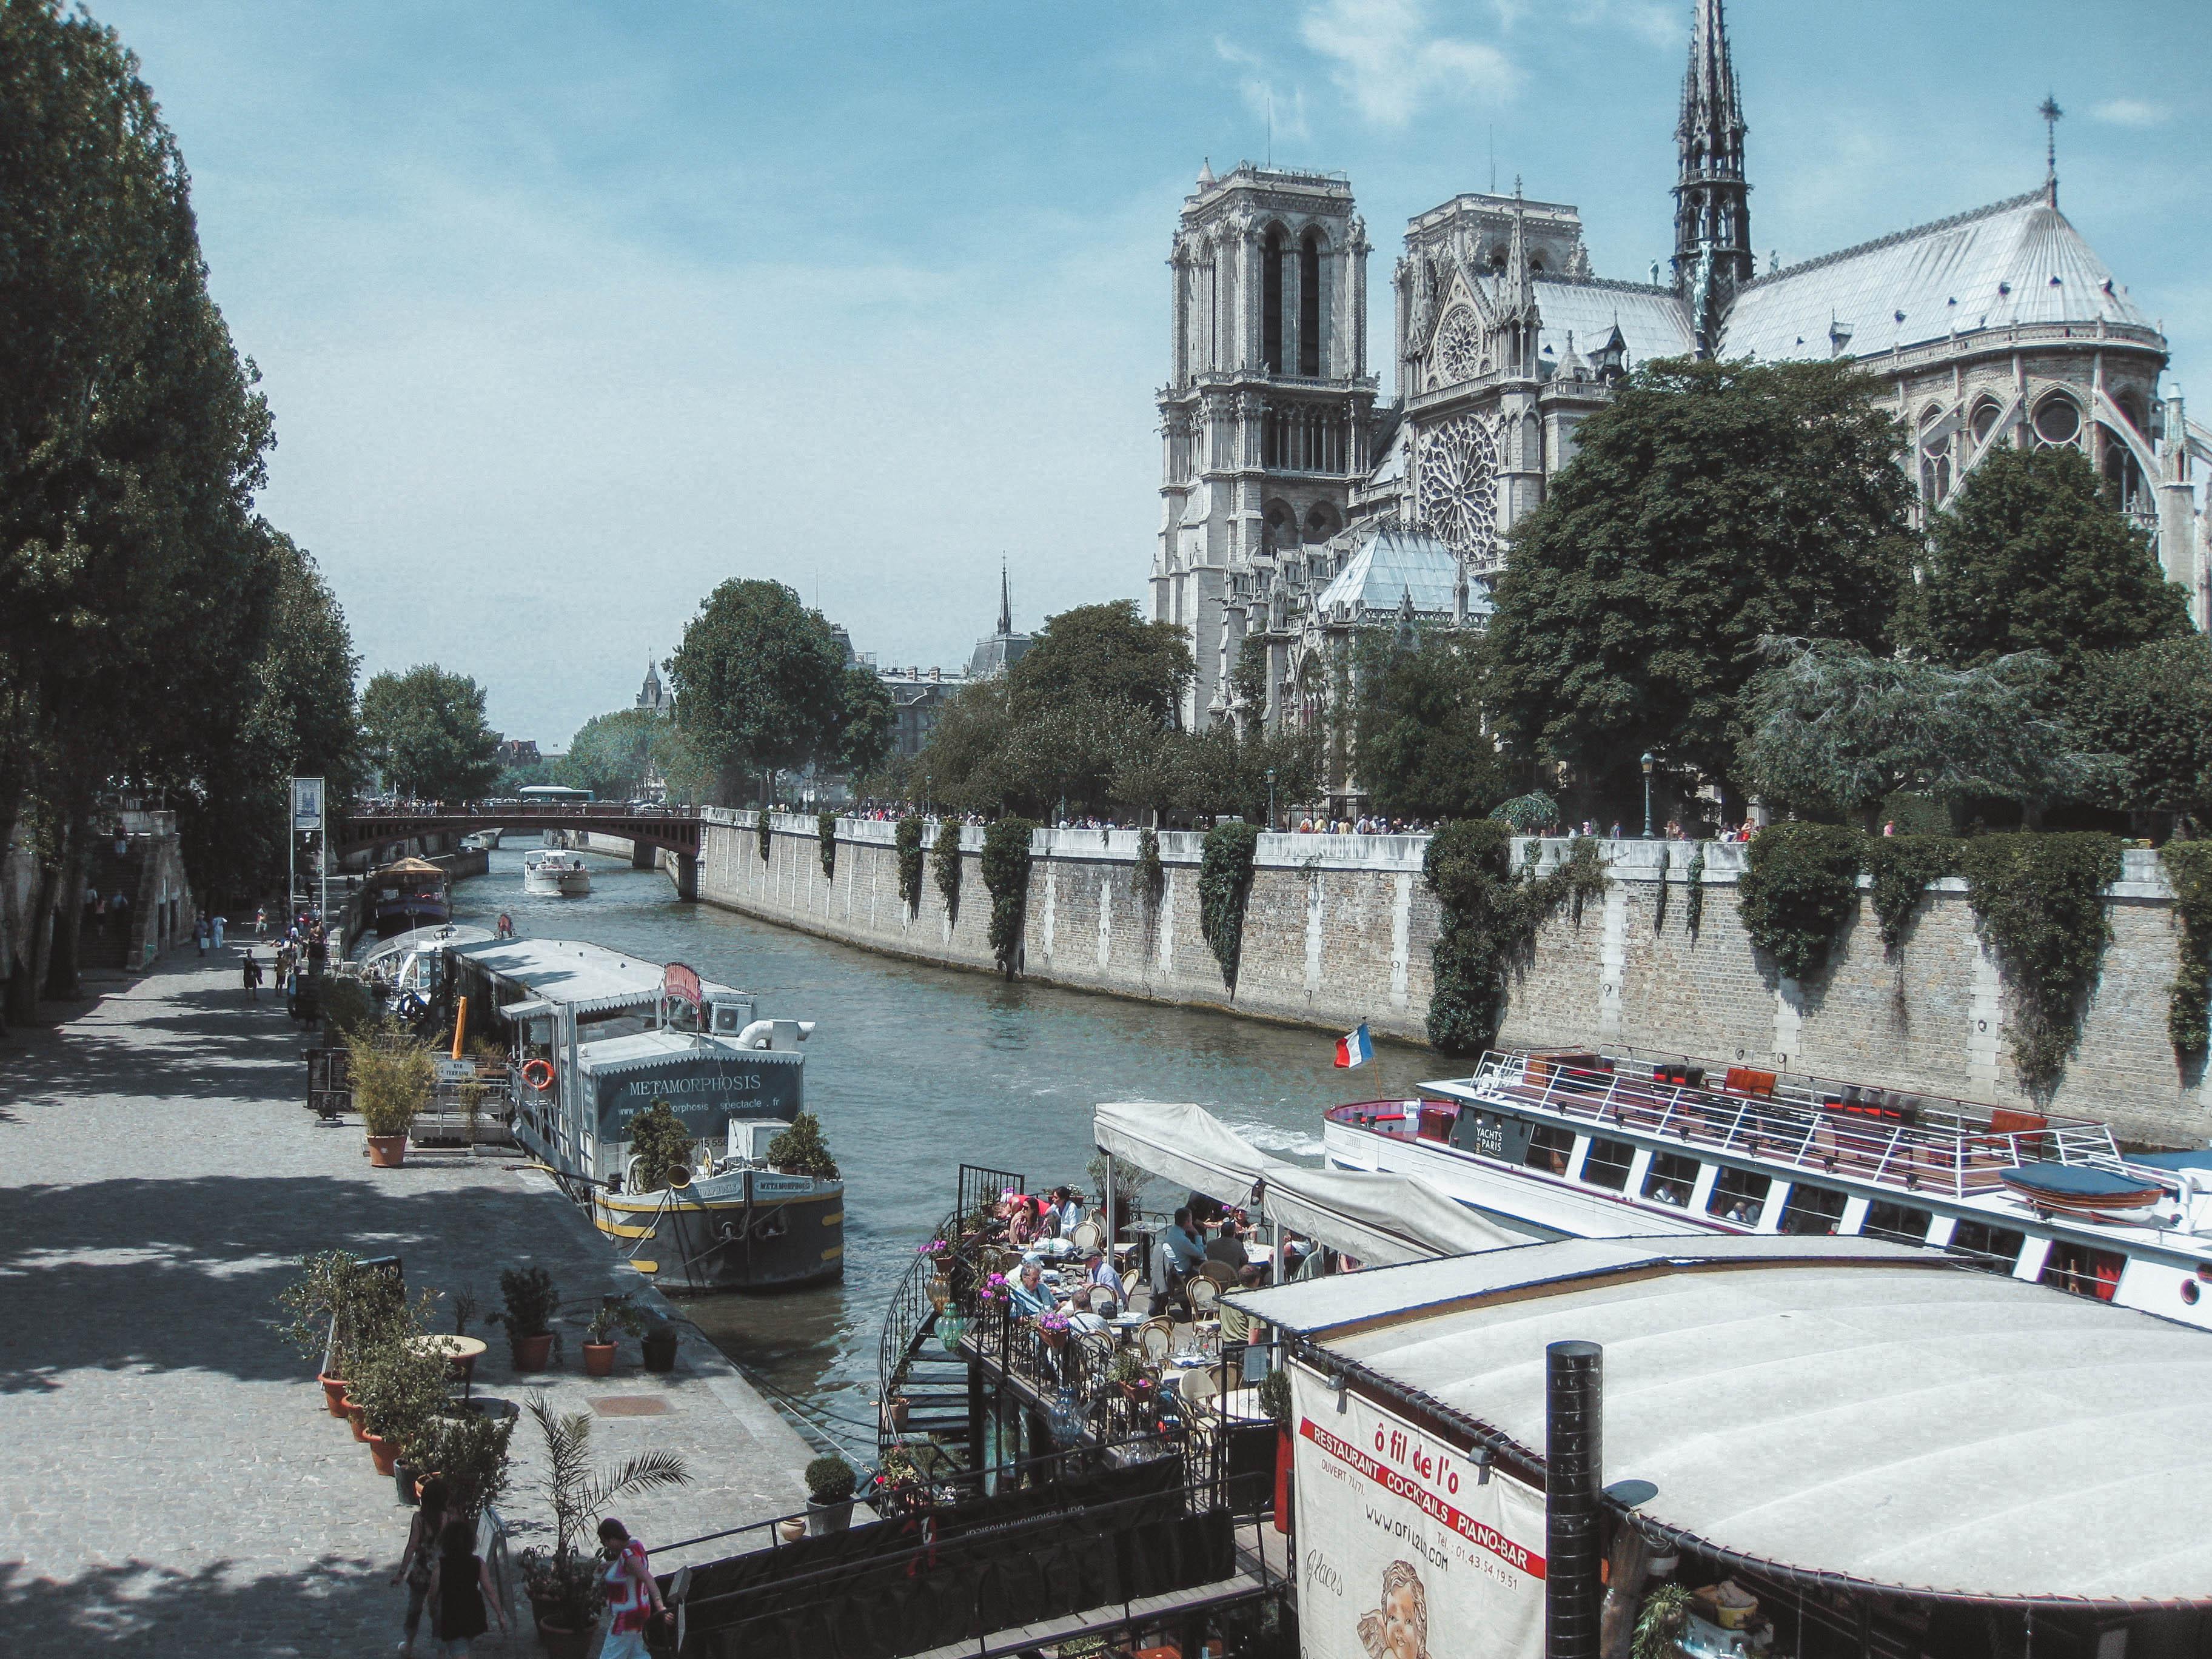 Paris Itinerary: Seine River